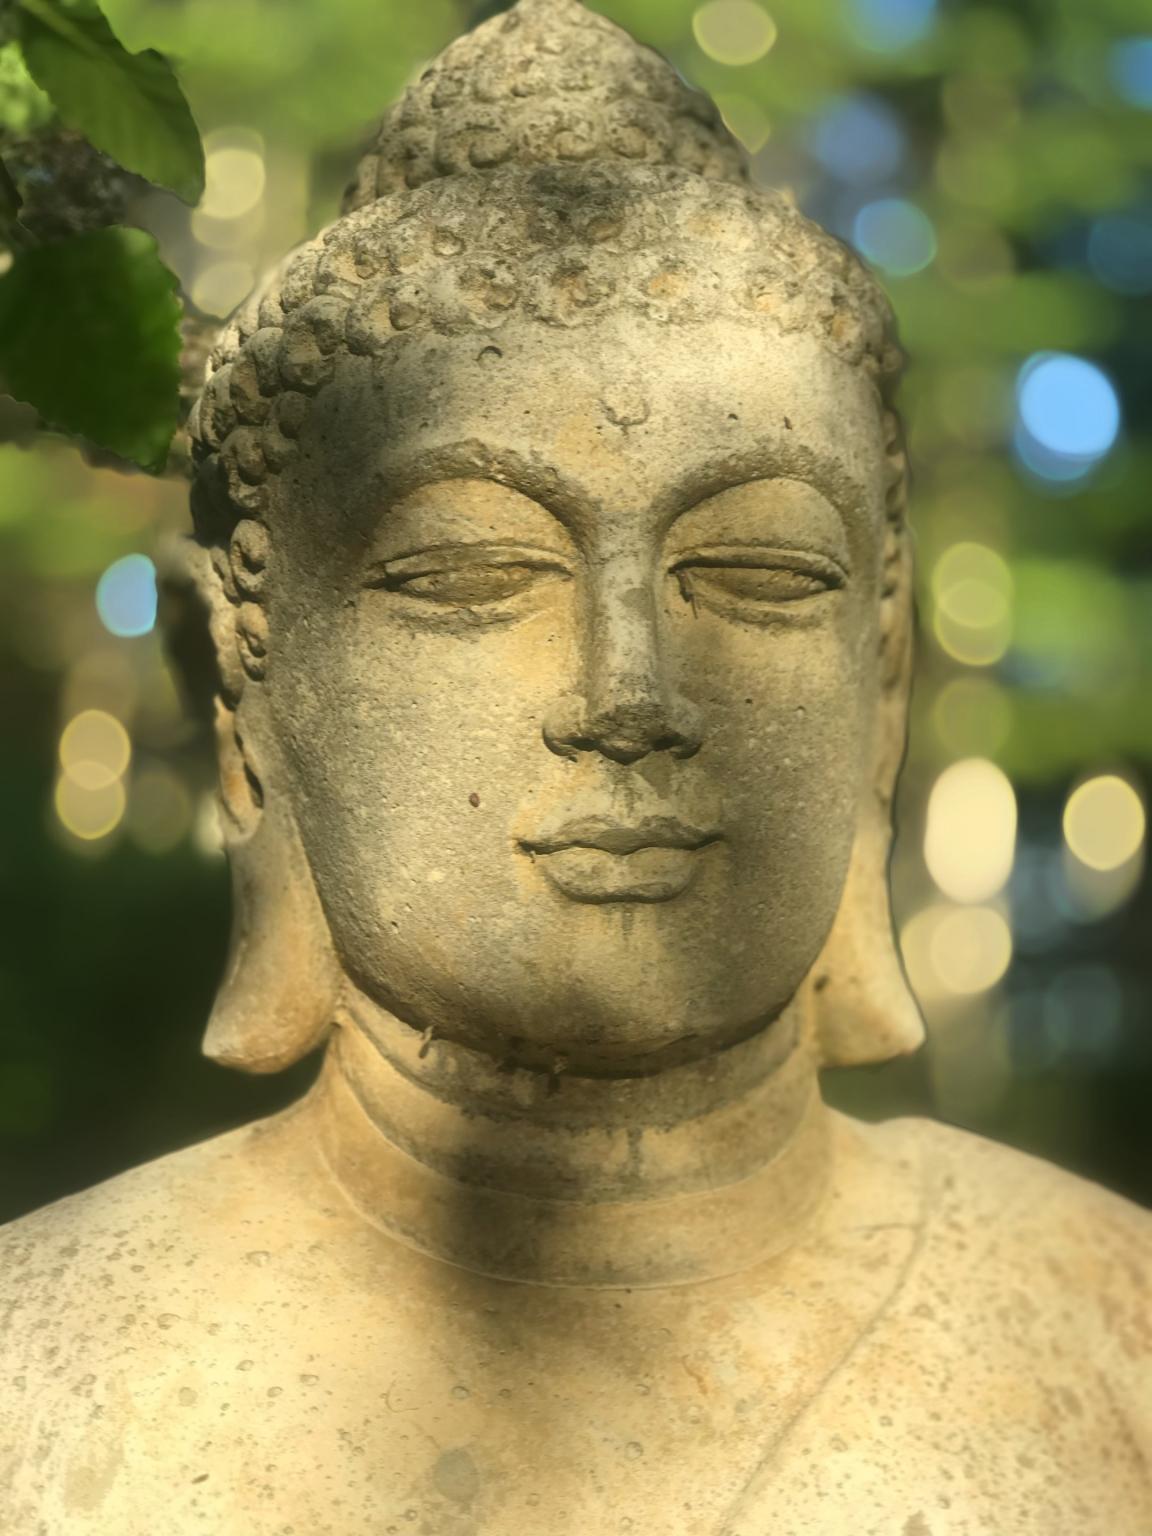 Introduction To Mindfulness Meditation - Session II